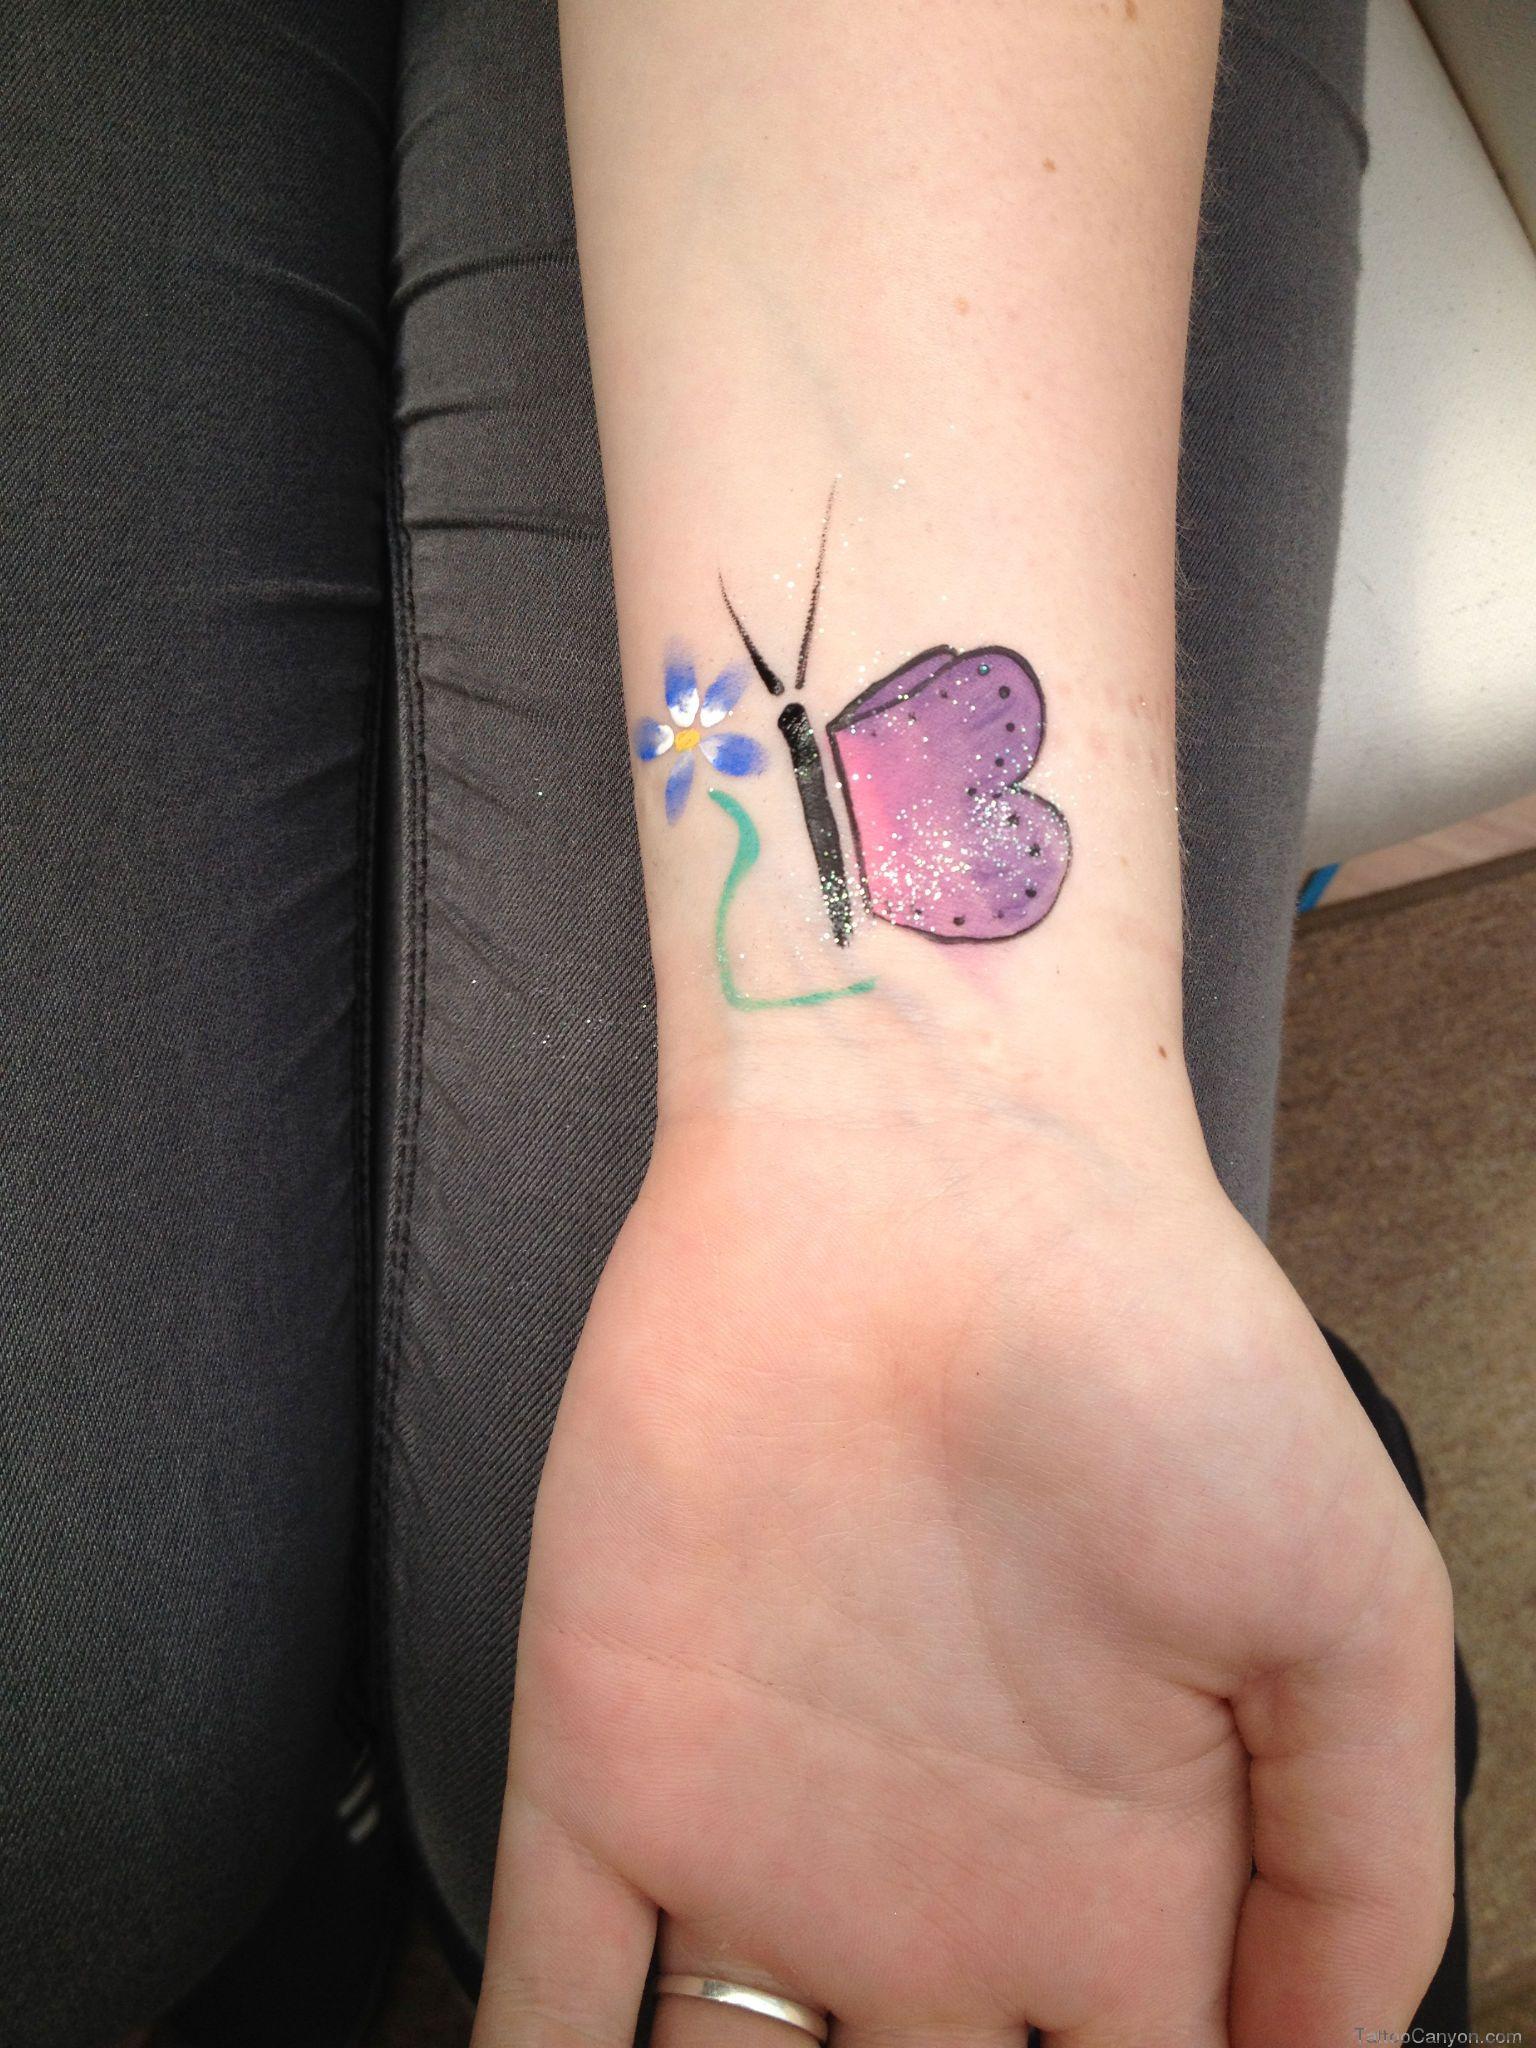 Girl tattoo ideas butterfly tattoo designs wrist tattoos ideas butterfly tattoo designs